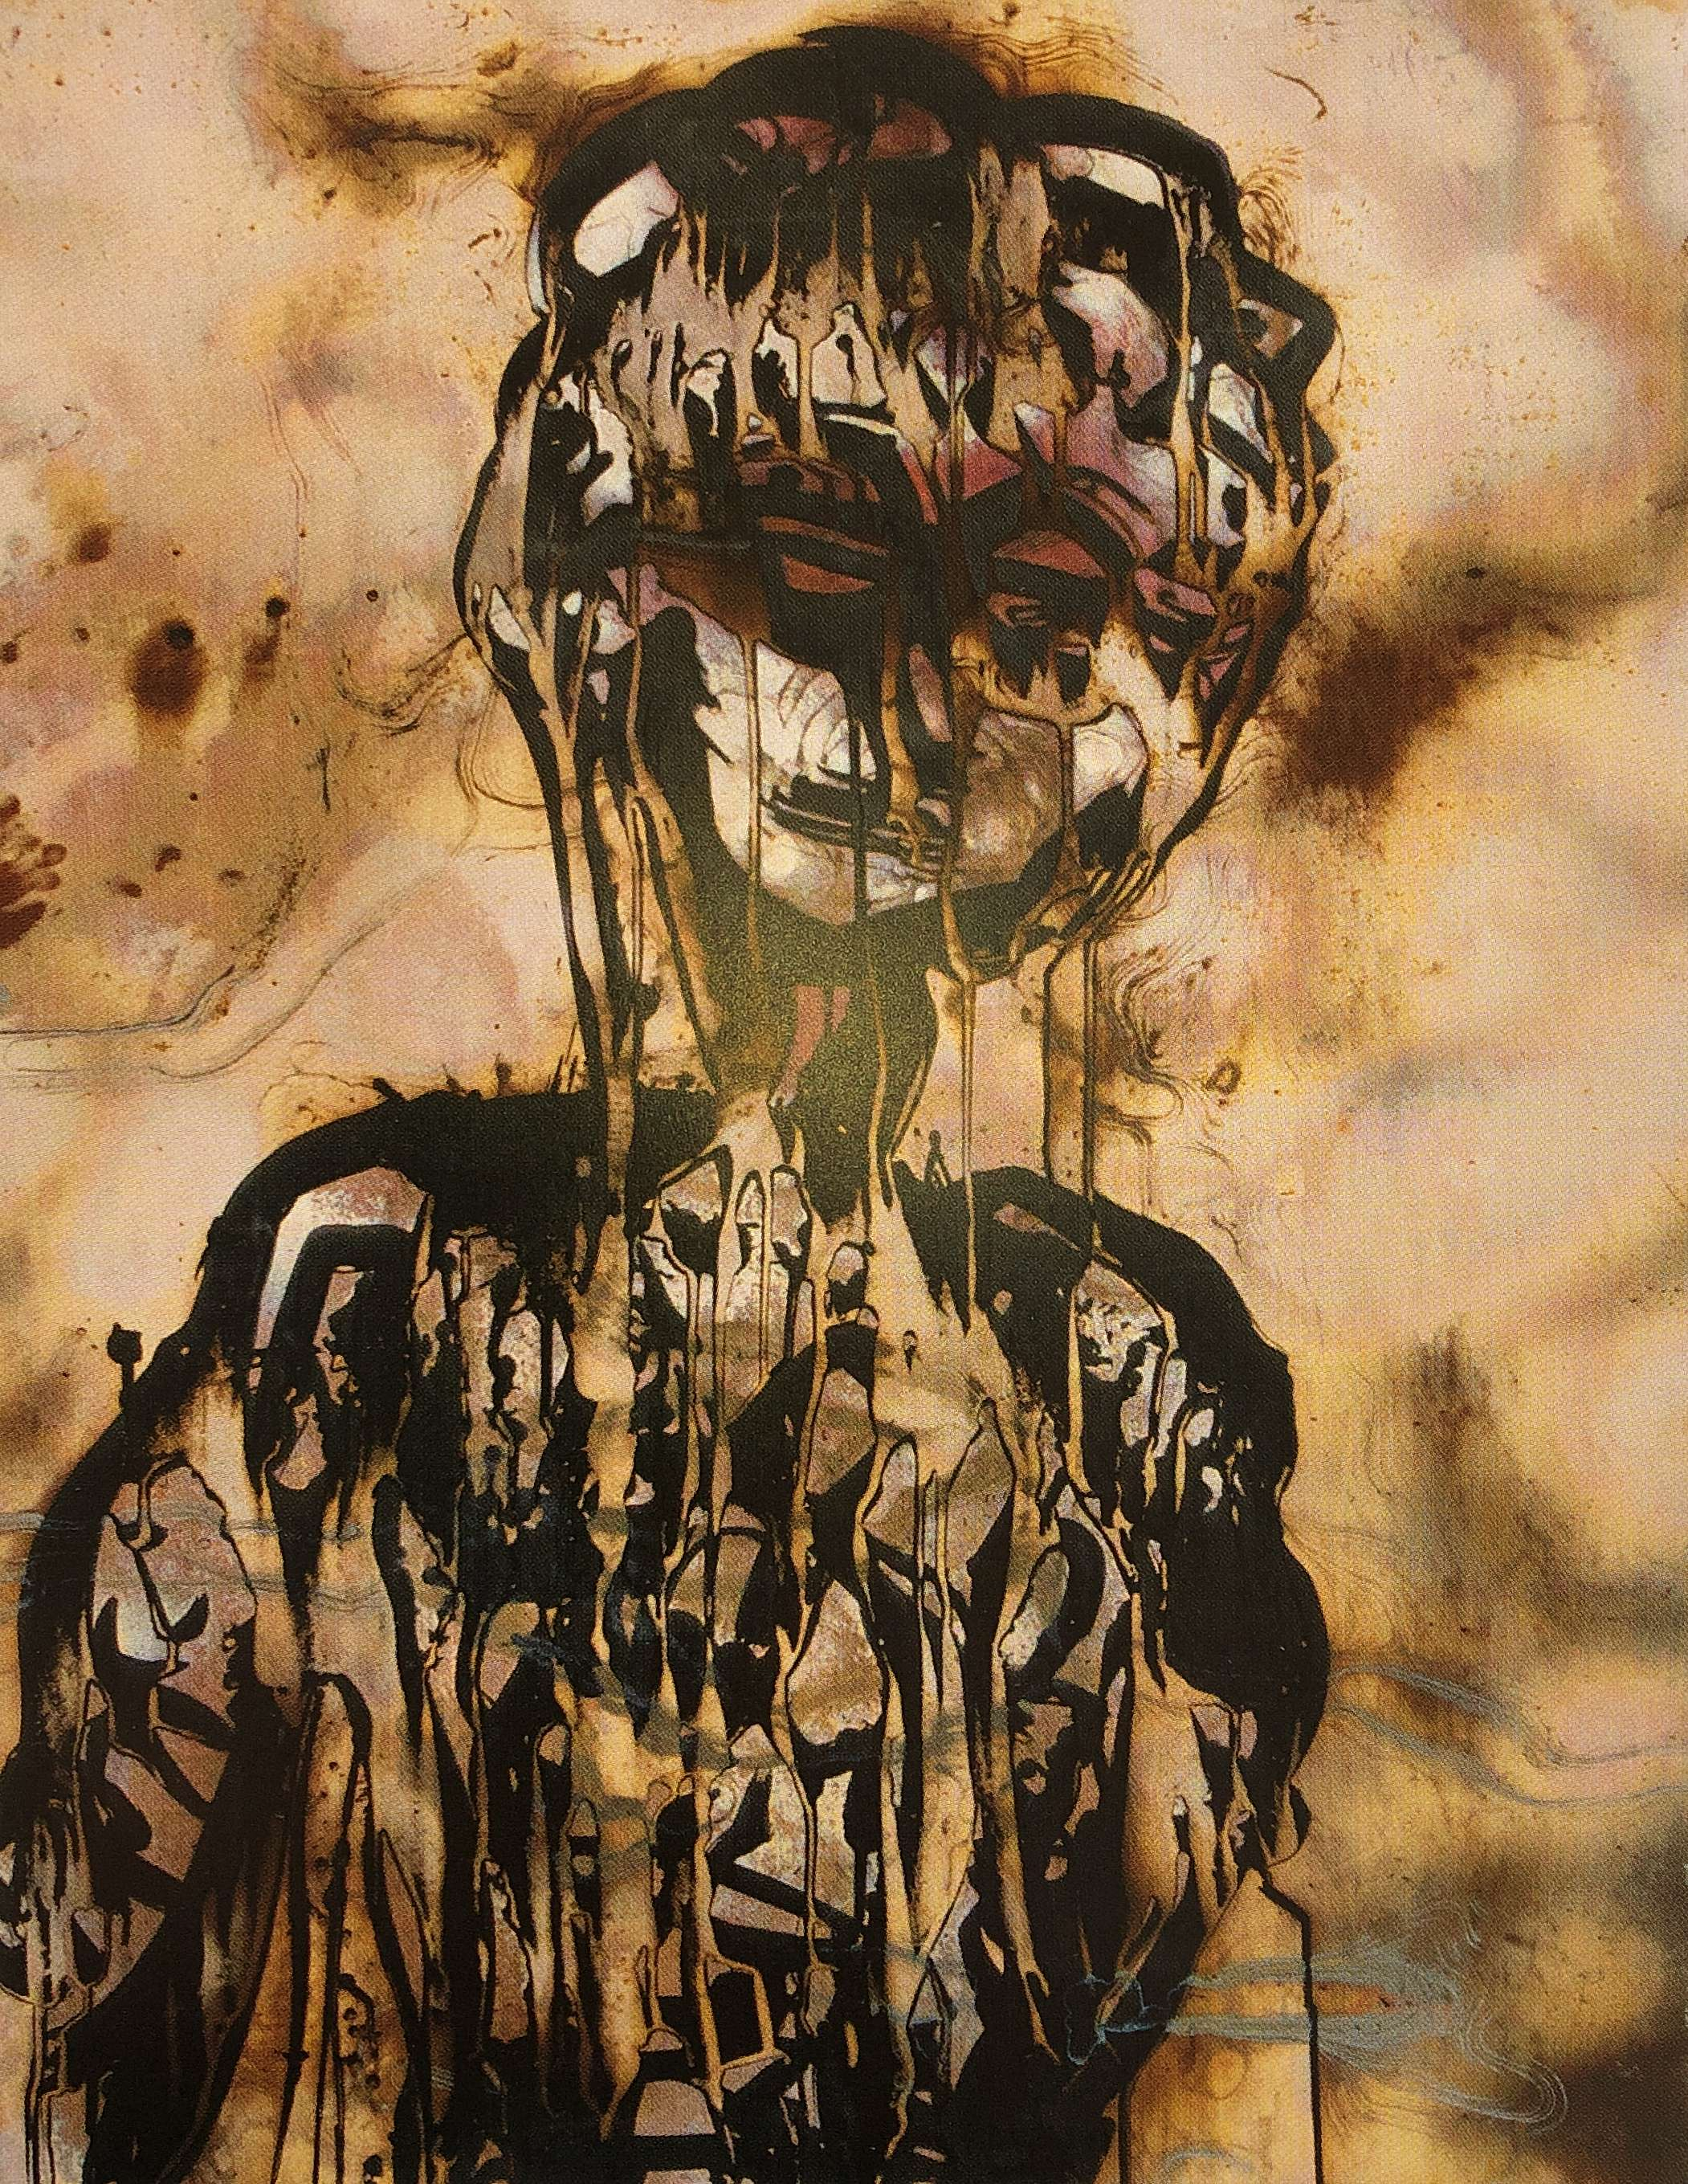 1989 - Guyla La Tristesse